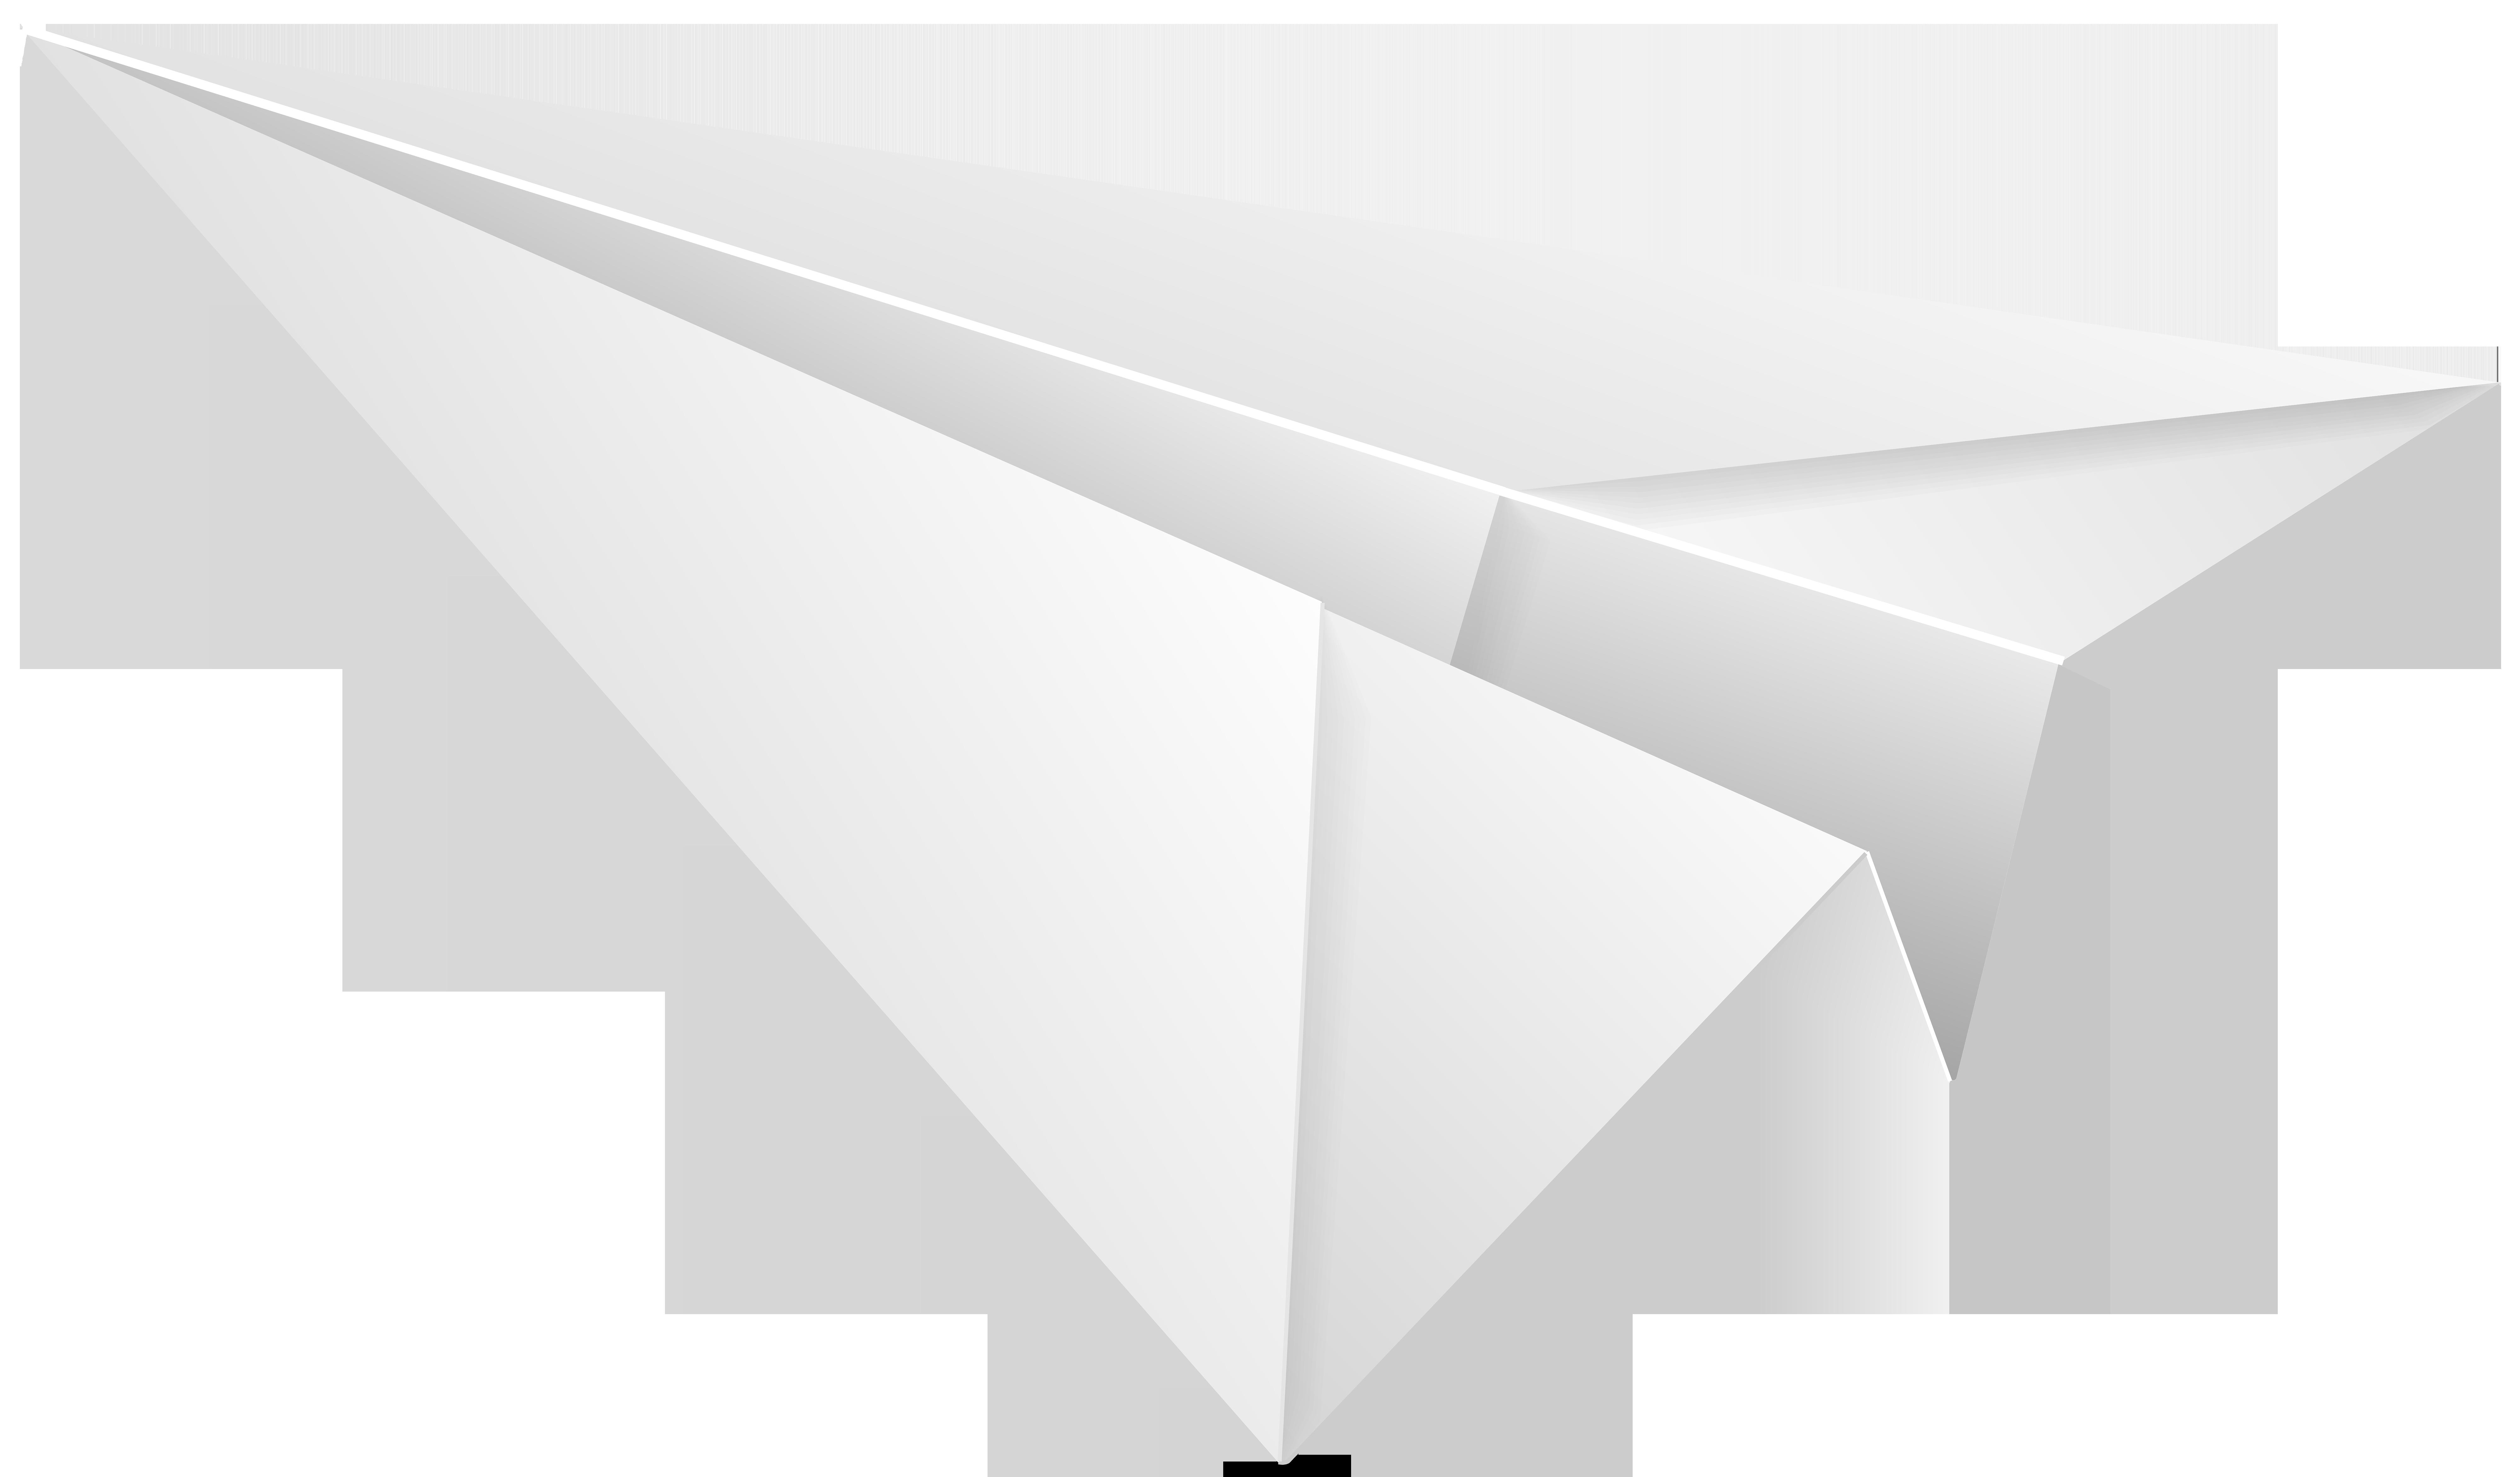 8000x4689 Paper Plane Png Clip Art Imageu200b Gallery Yopriceville